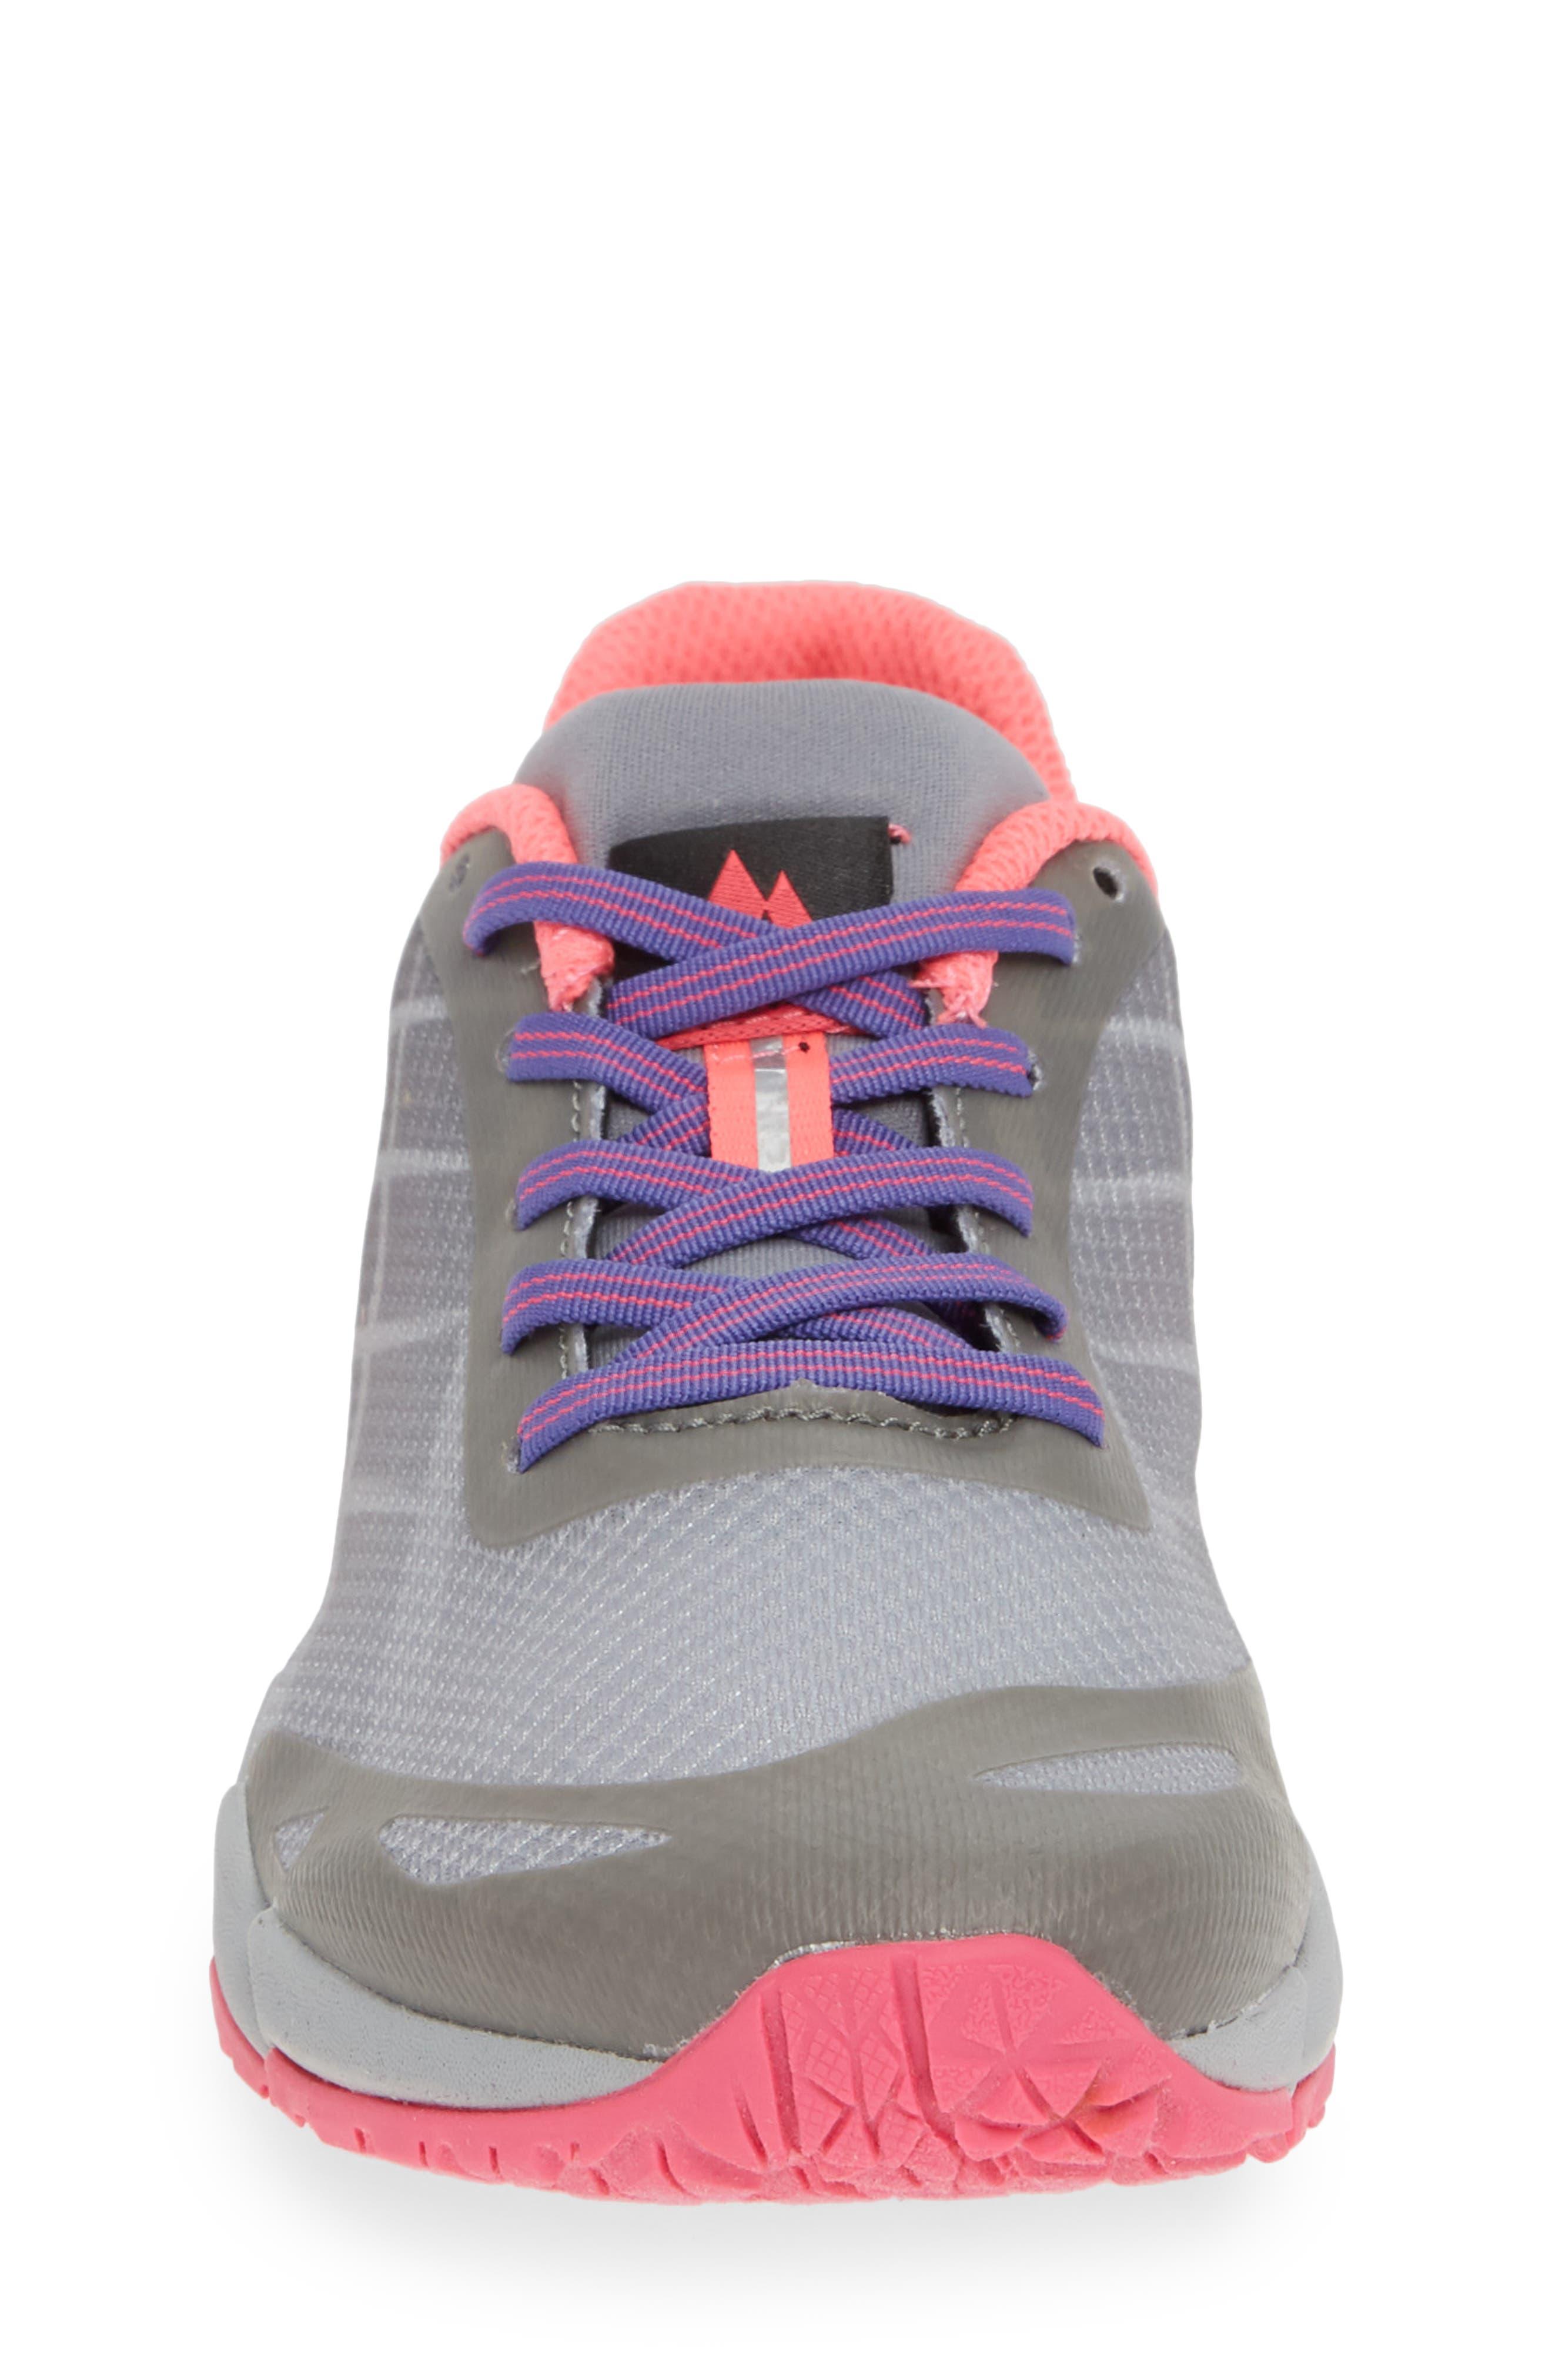 MERRELL, Bare Access Sneaker, Alternate thumbnail 4, color, GREY/ MULTI SYNTHETIC